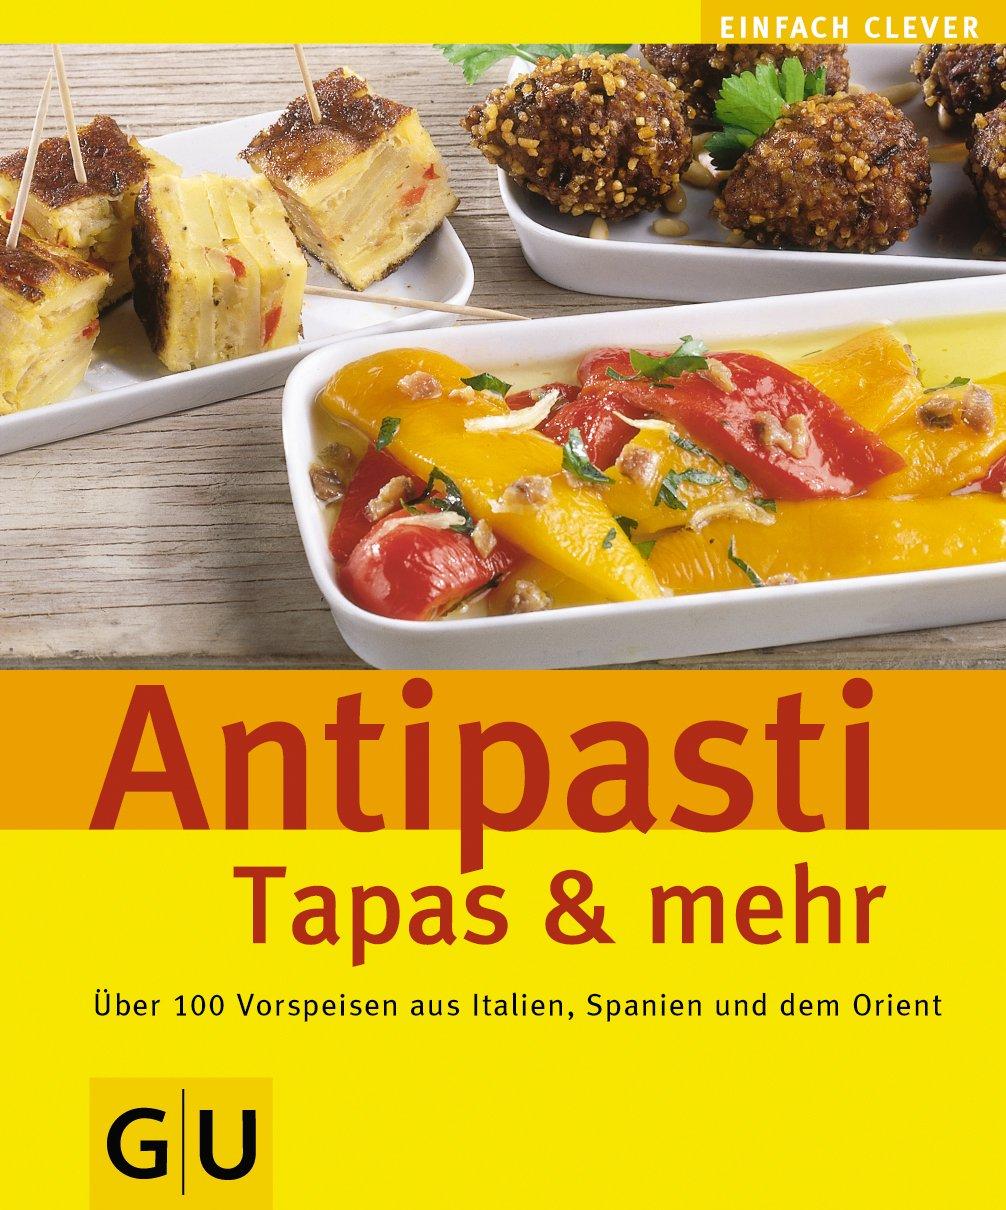 Antipasti, Tapas & mehr